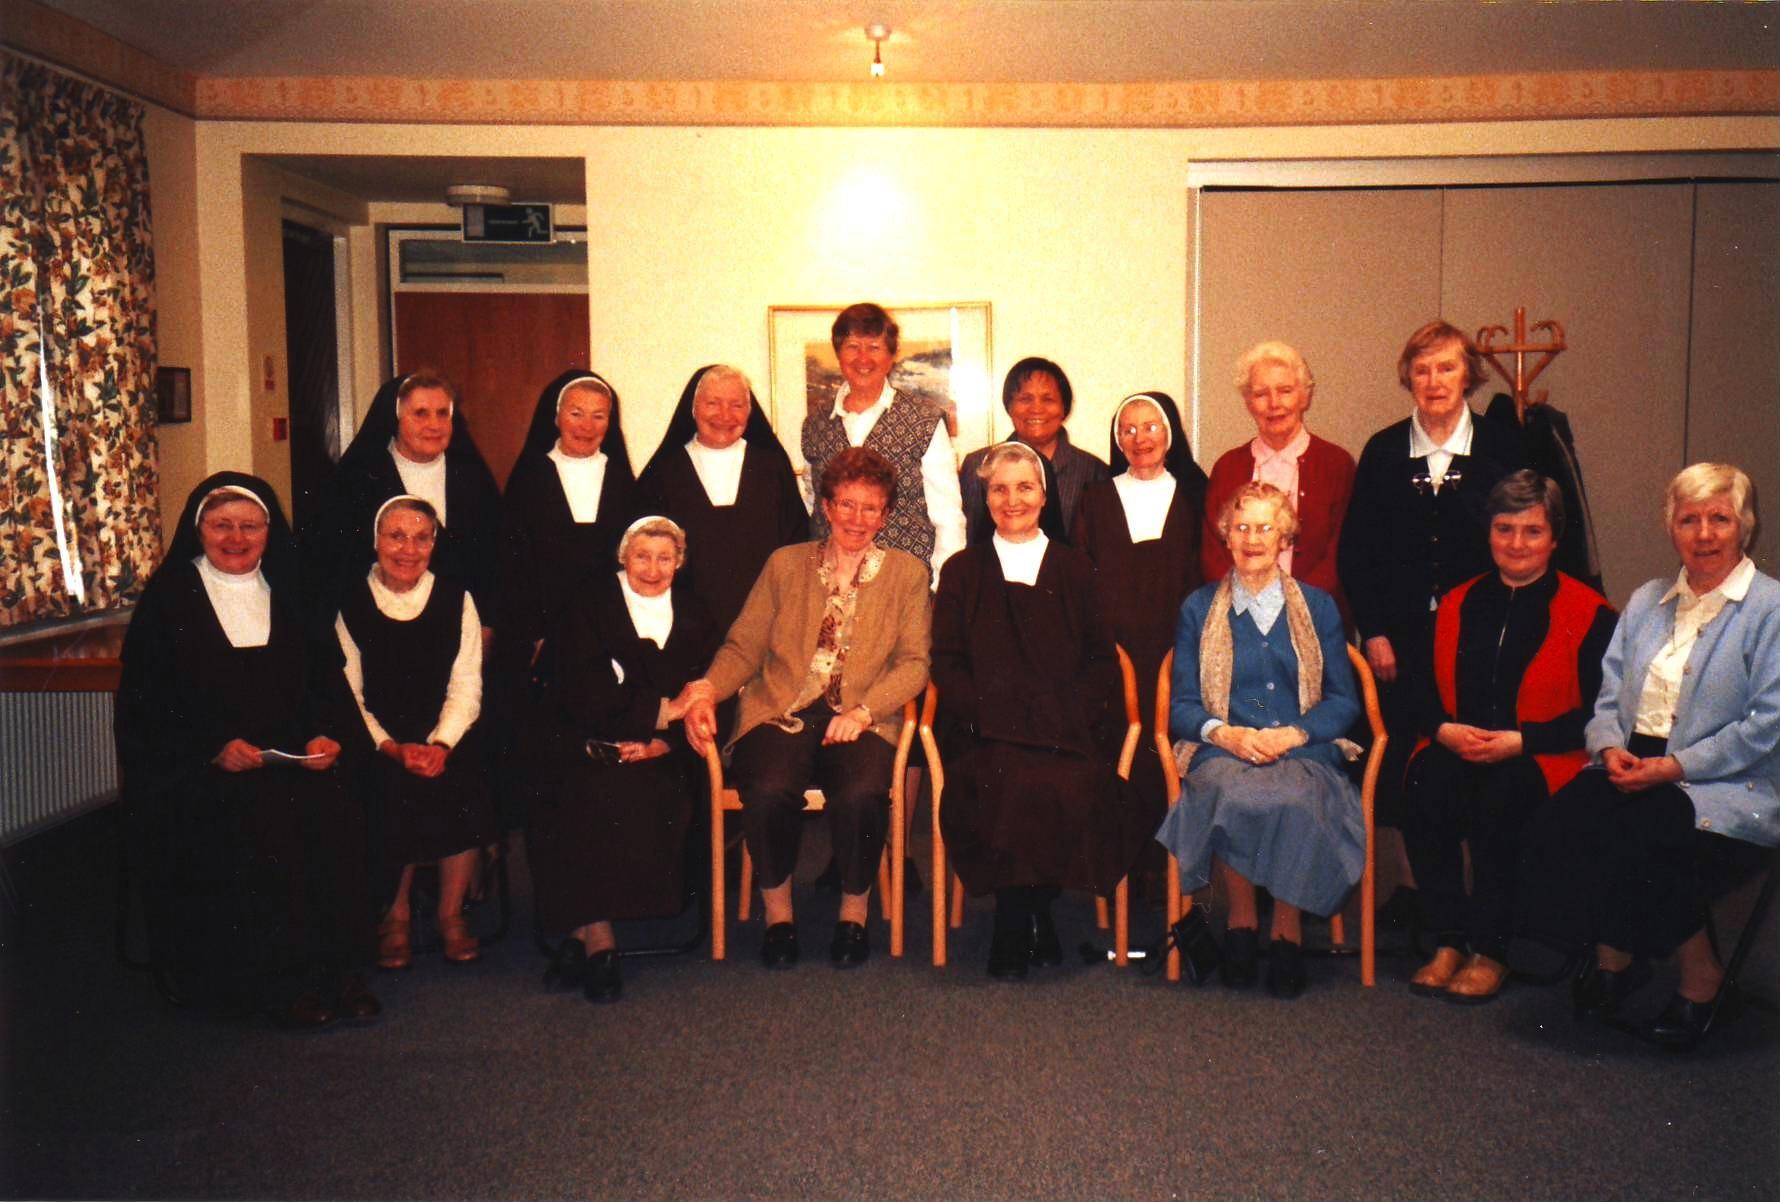 Sr. Loreto and Nenita's visit to Carmelite Convent, Malahide, May 2006